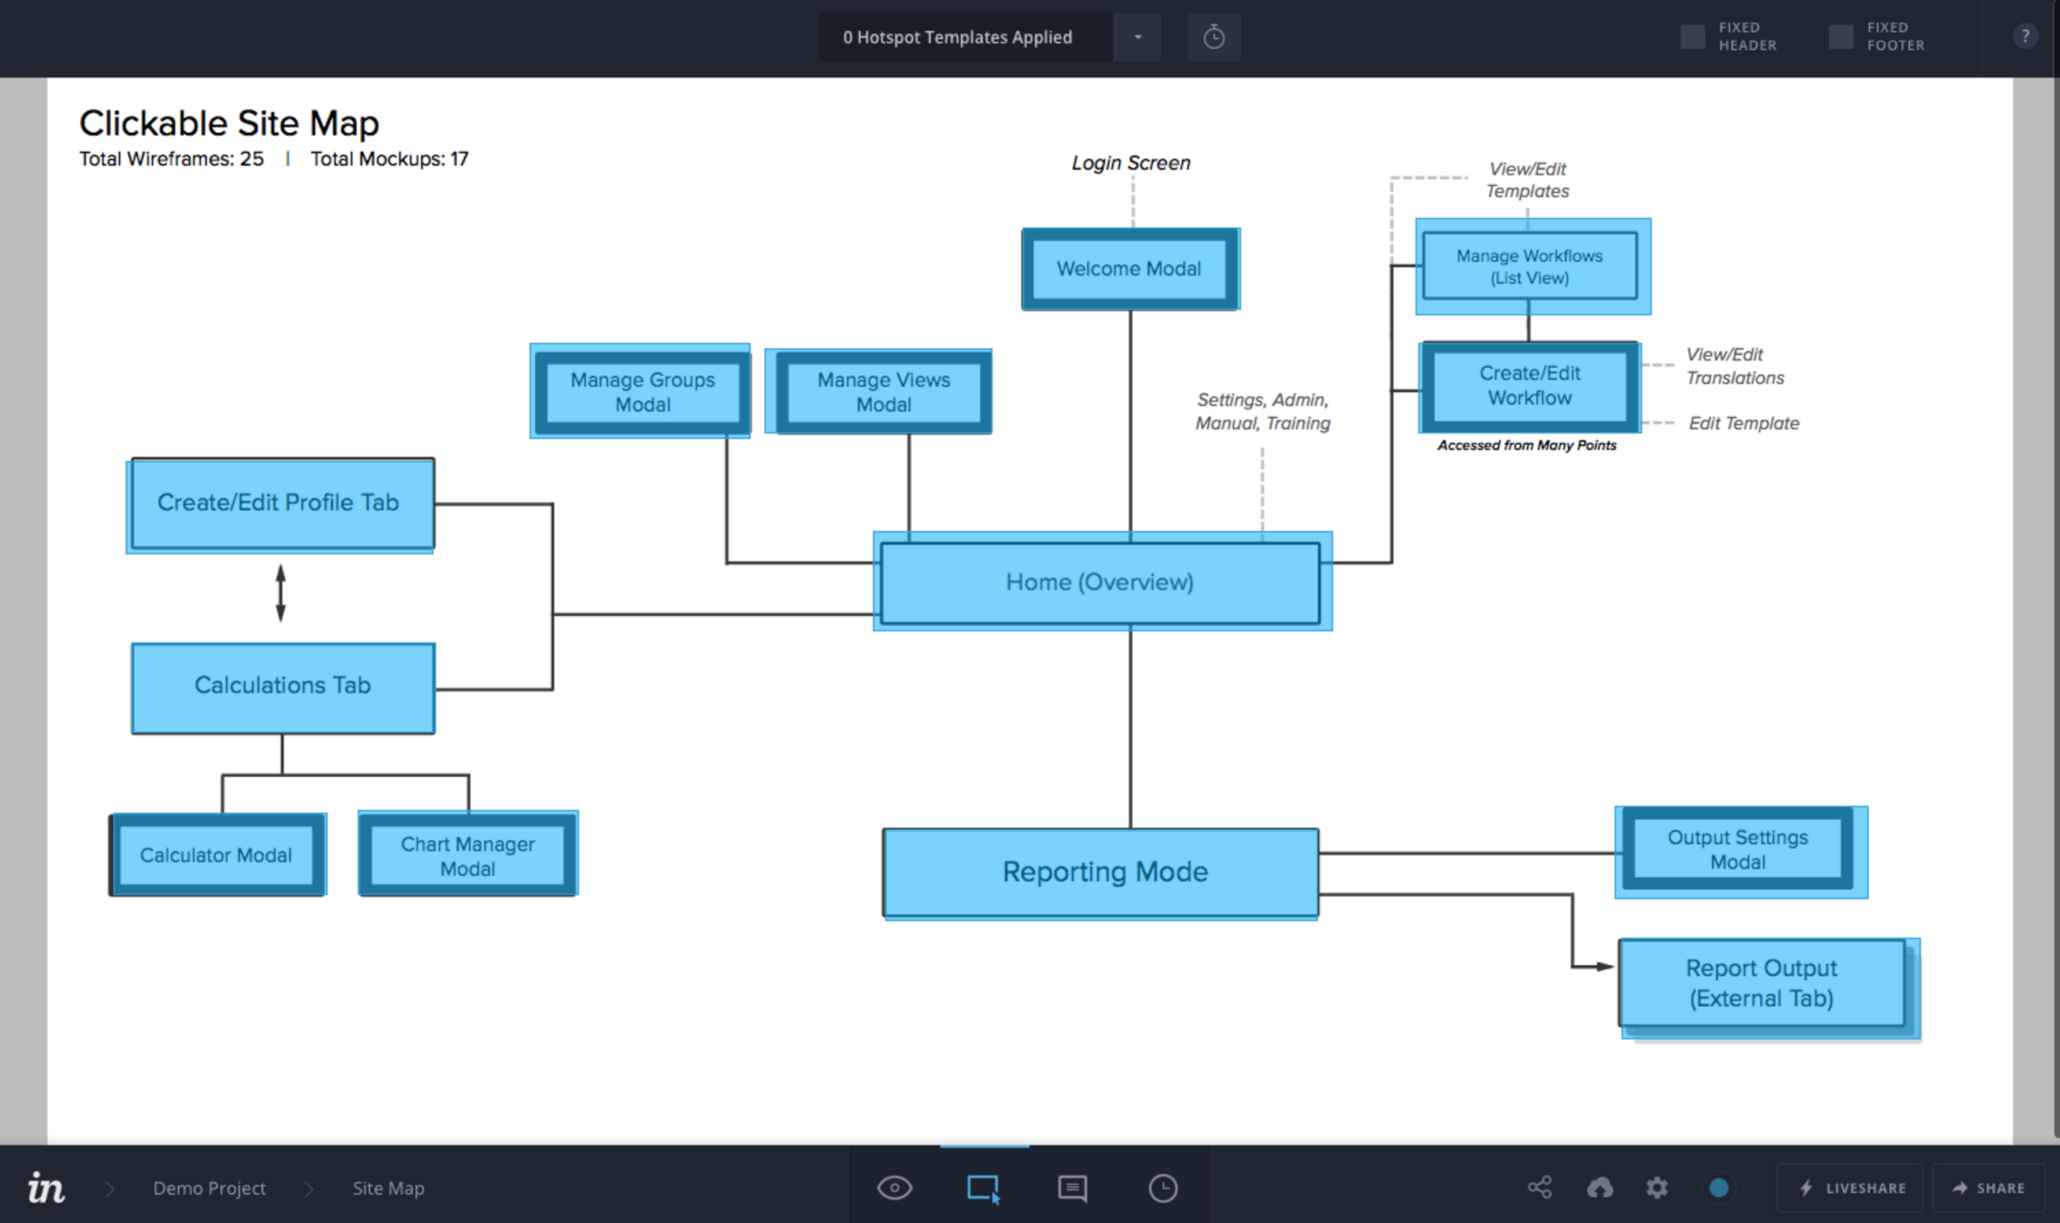 screenshot of site map in digital prototyping tool